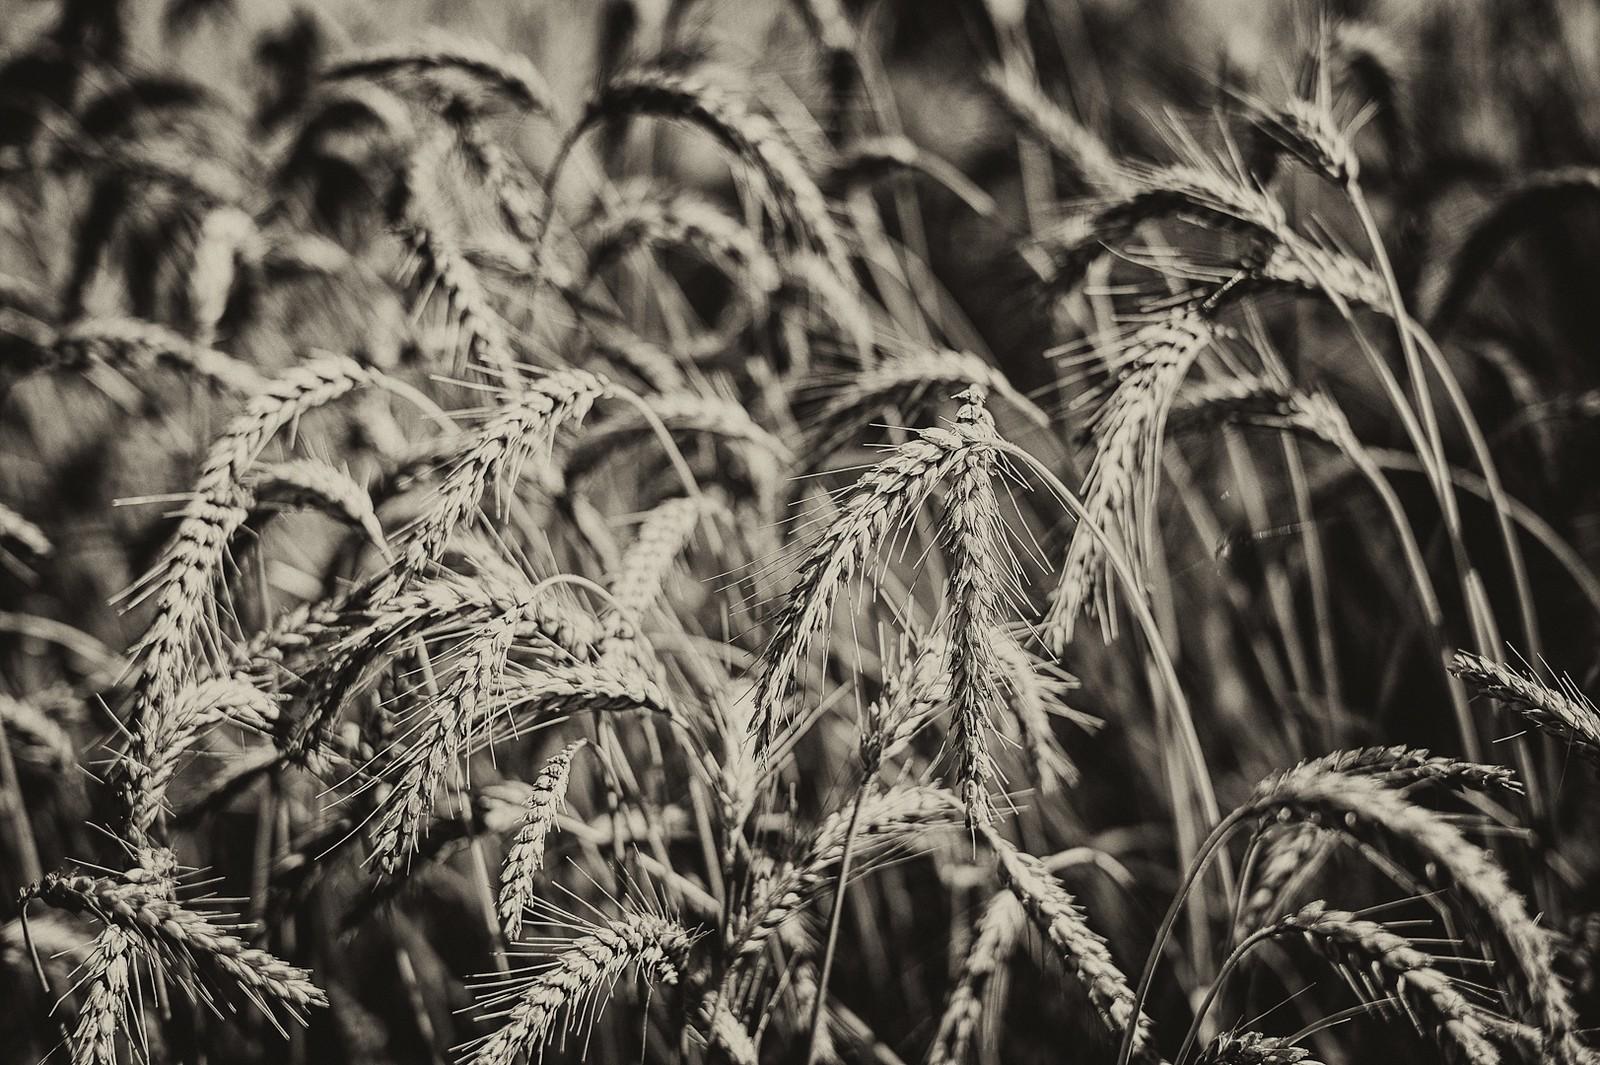 2012-Varia_Leica_2012-07-24_11-44-58_00962-Edit-X3.jpg